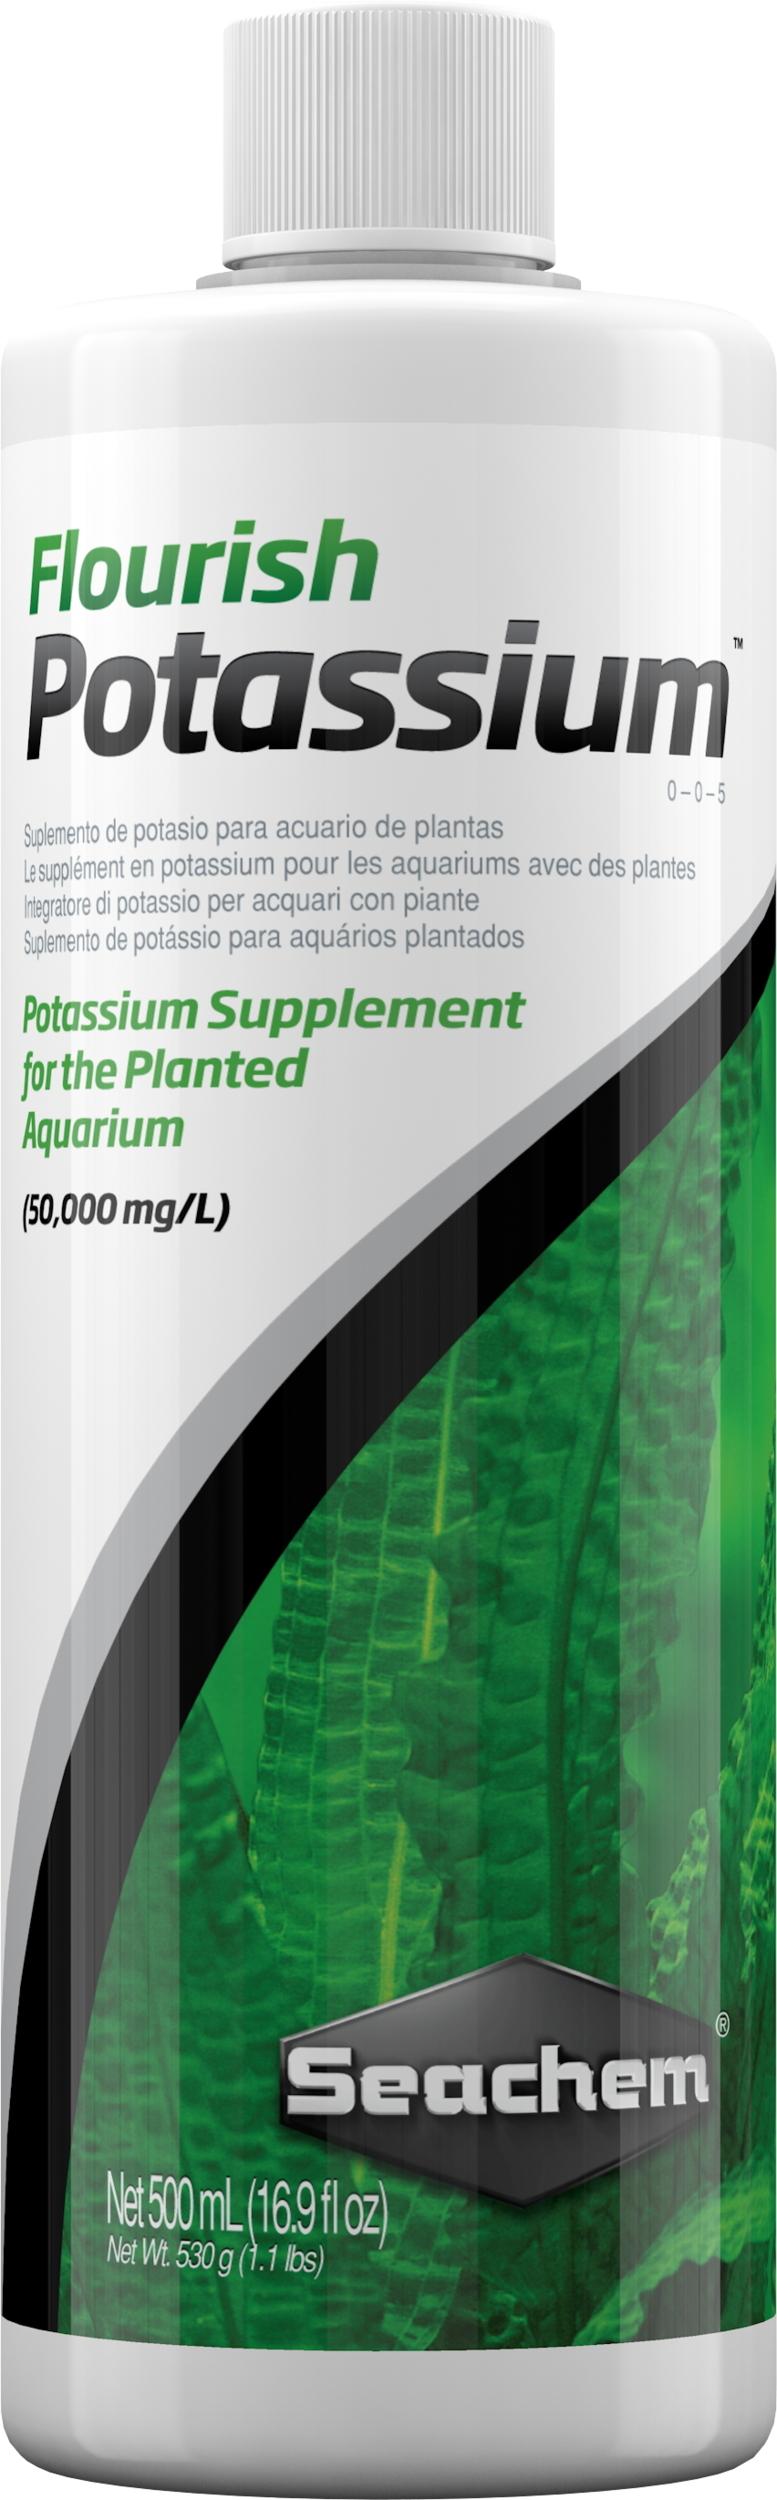 FlourishPotassium-500mL